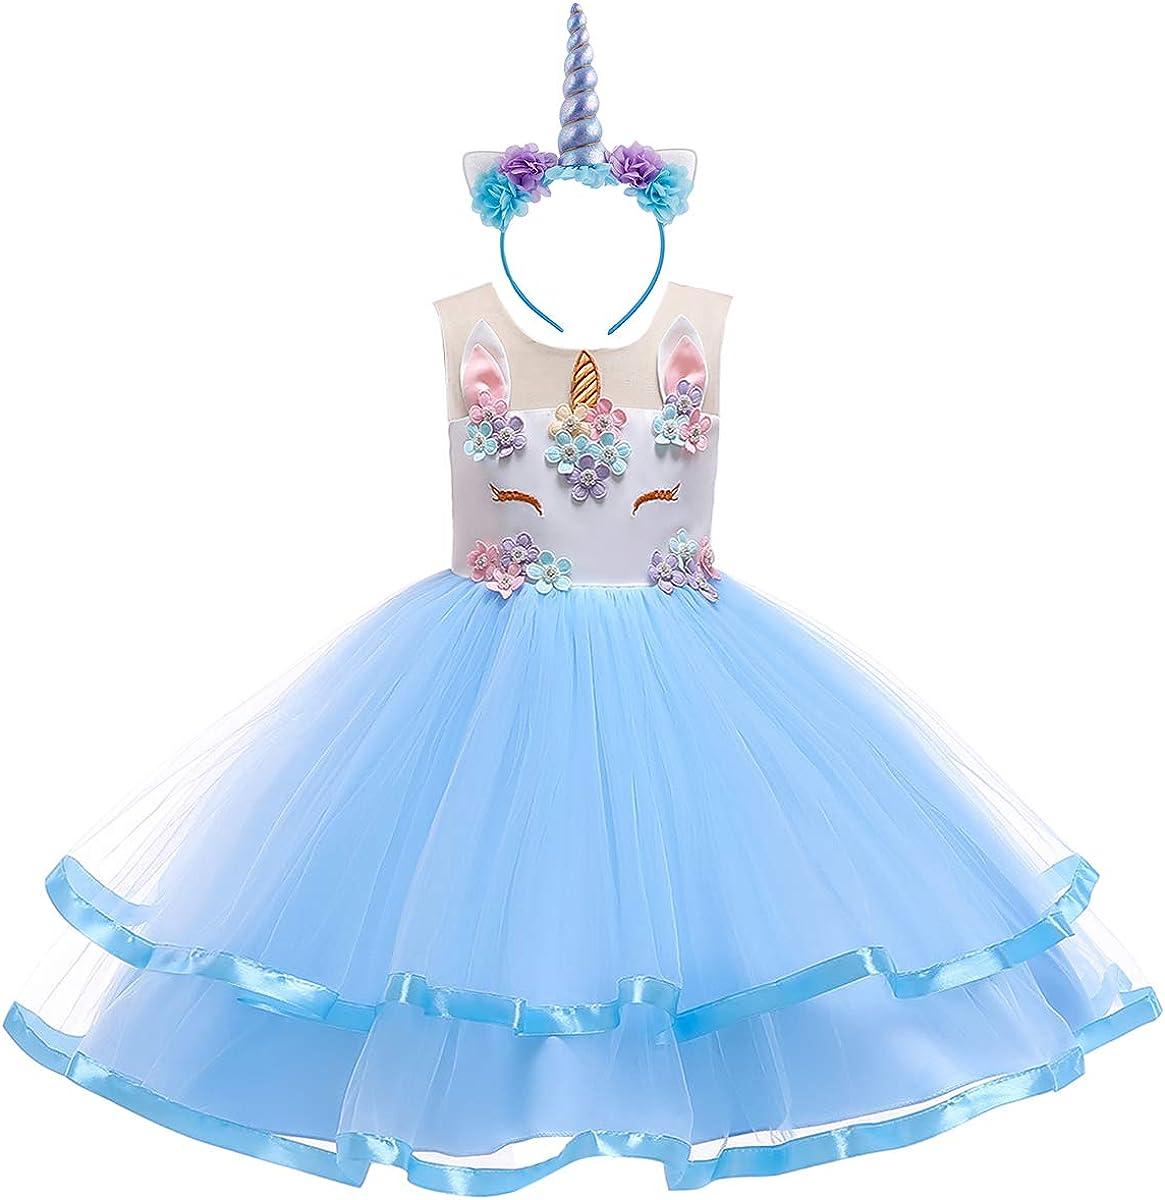 Niña Princesa Vestido Unicornio Disfraz de Cosplay para Fiesta ...